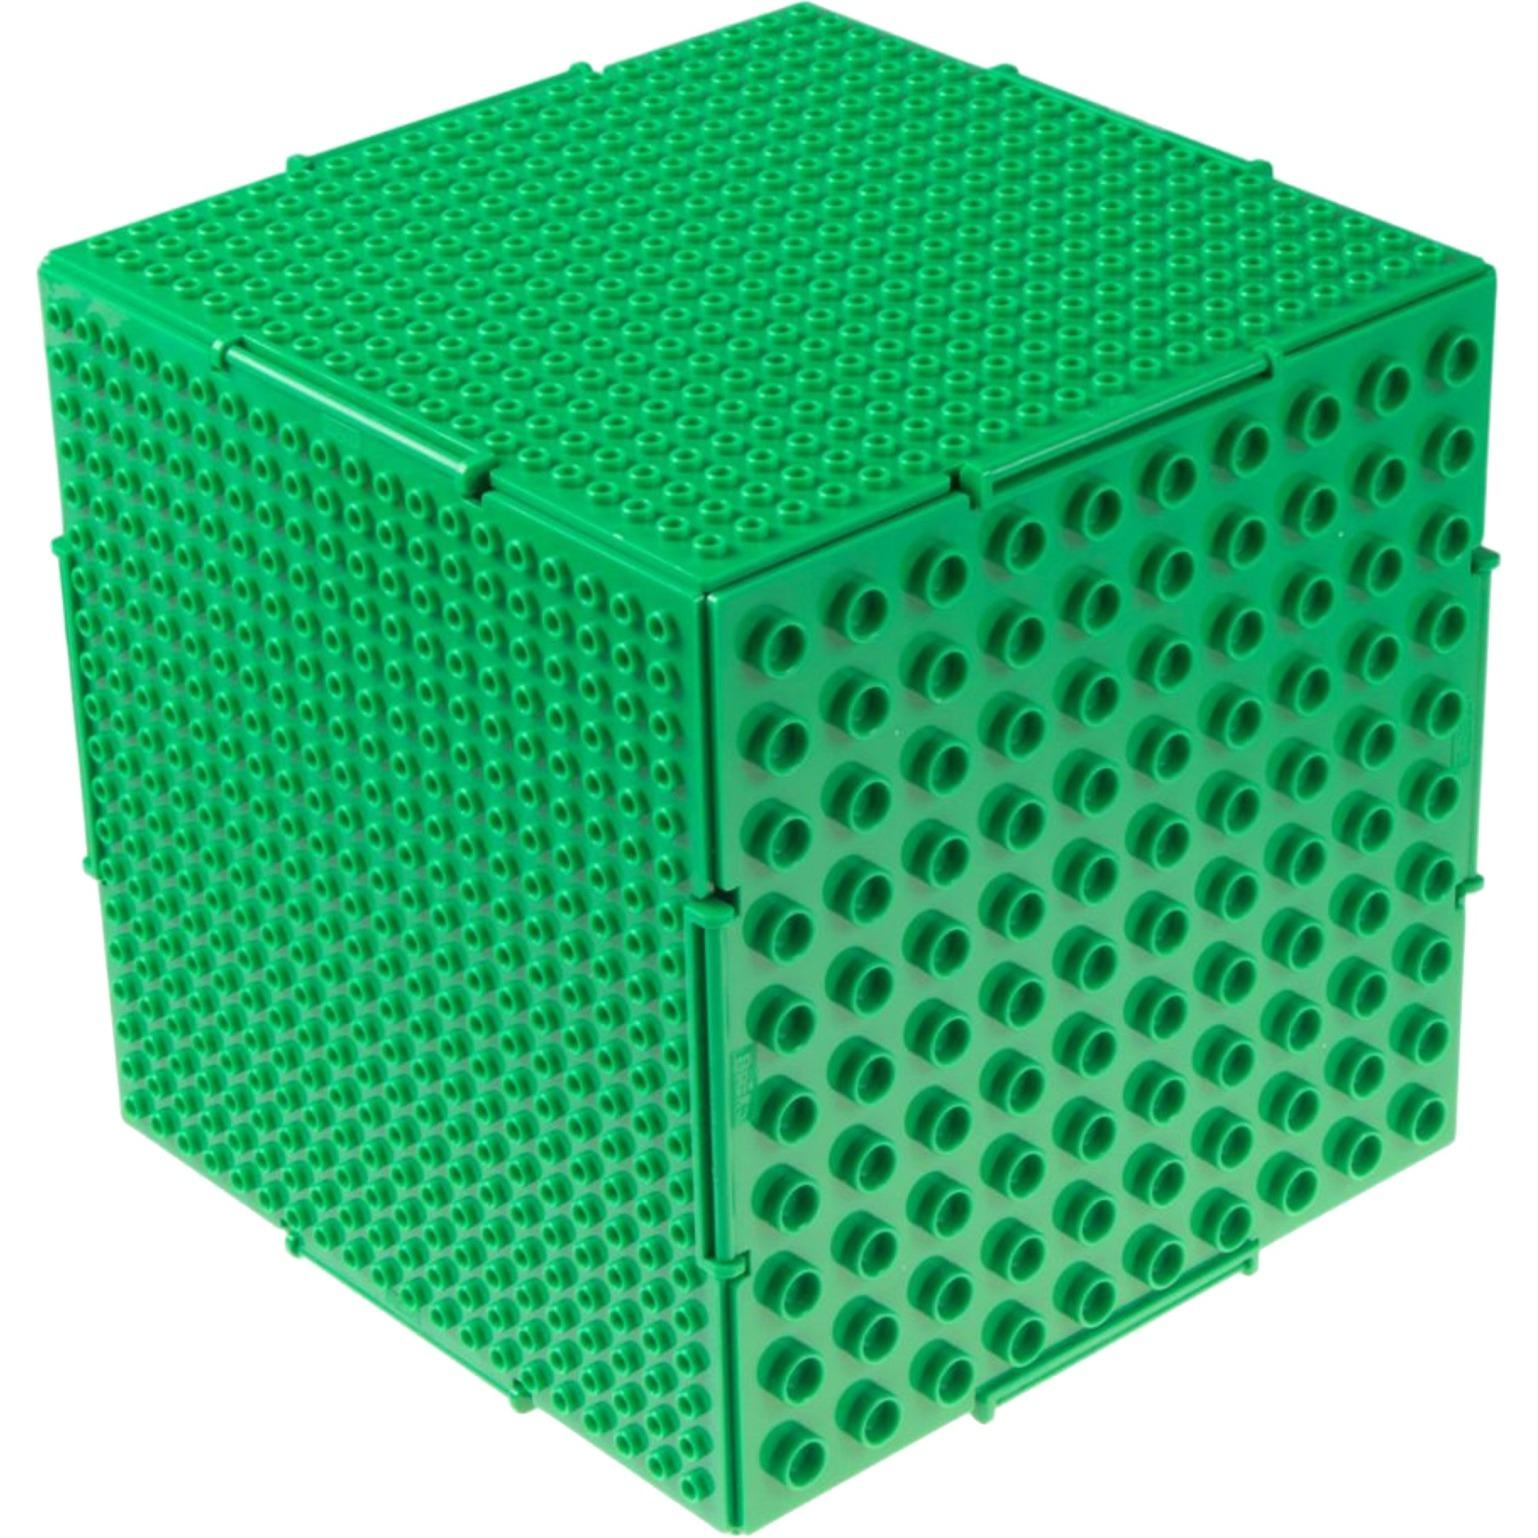 The Cube double sided Green, Juegos de construcción